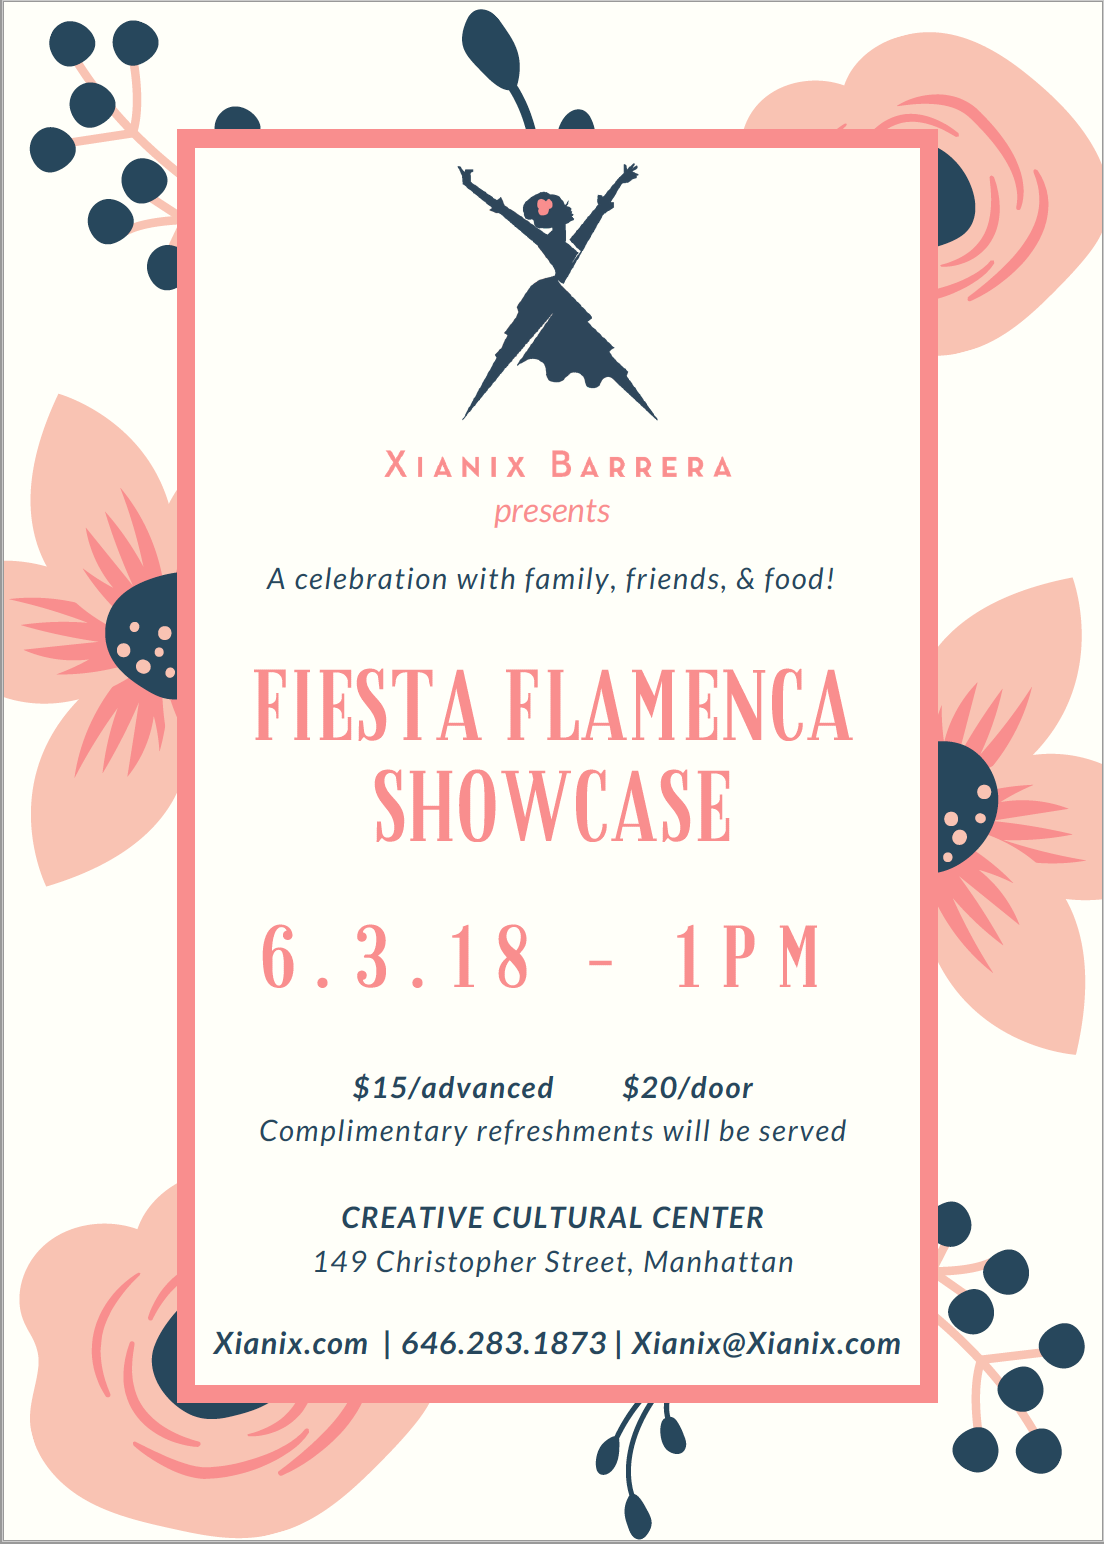 Fiesta Flamenca 5.0 -Annual Flamenco Student Showcase